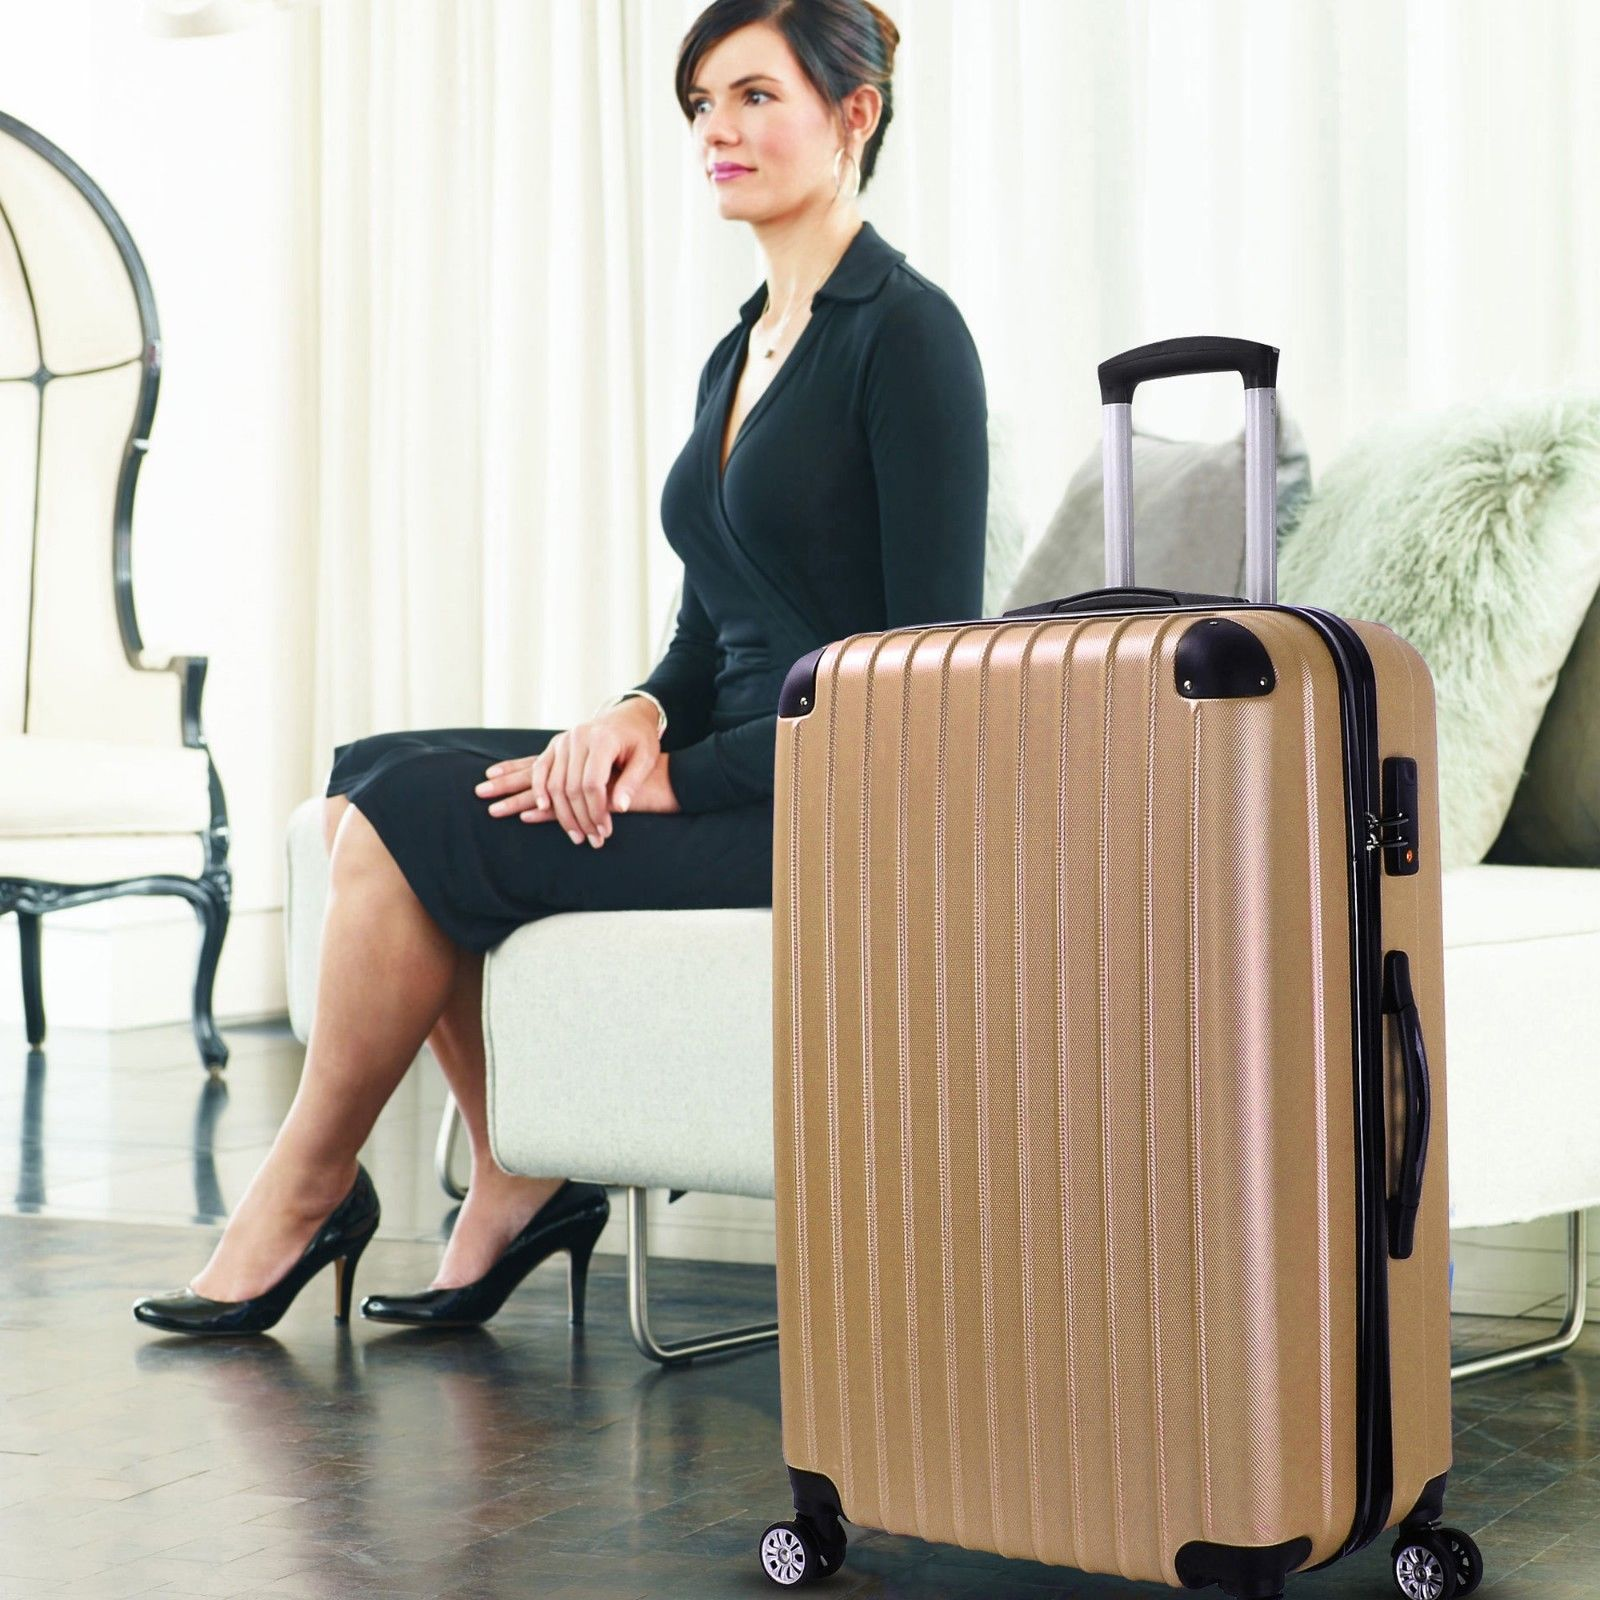 Milano-Premium-3pc-ABS-Luggage-Suitcase-Luxury-Hard-Case-Shockproof-Travel-Set thumbnail 17